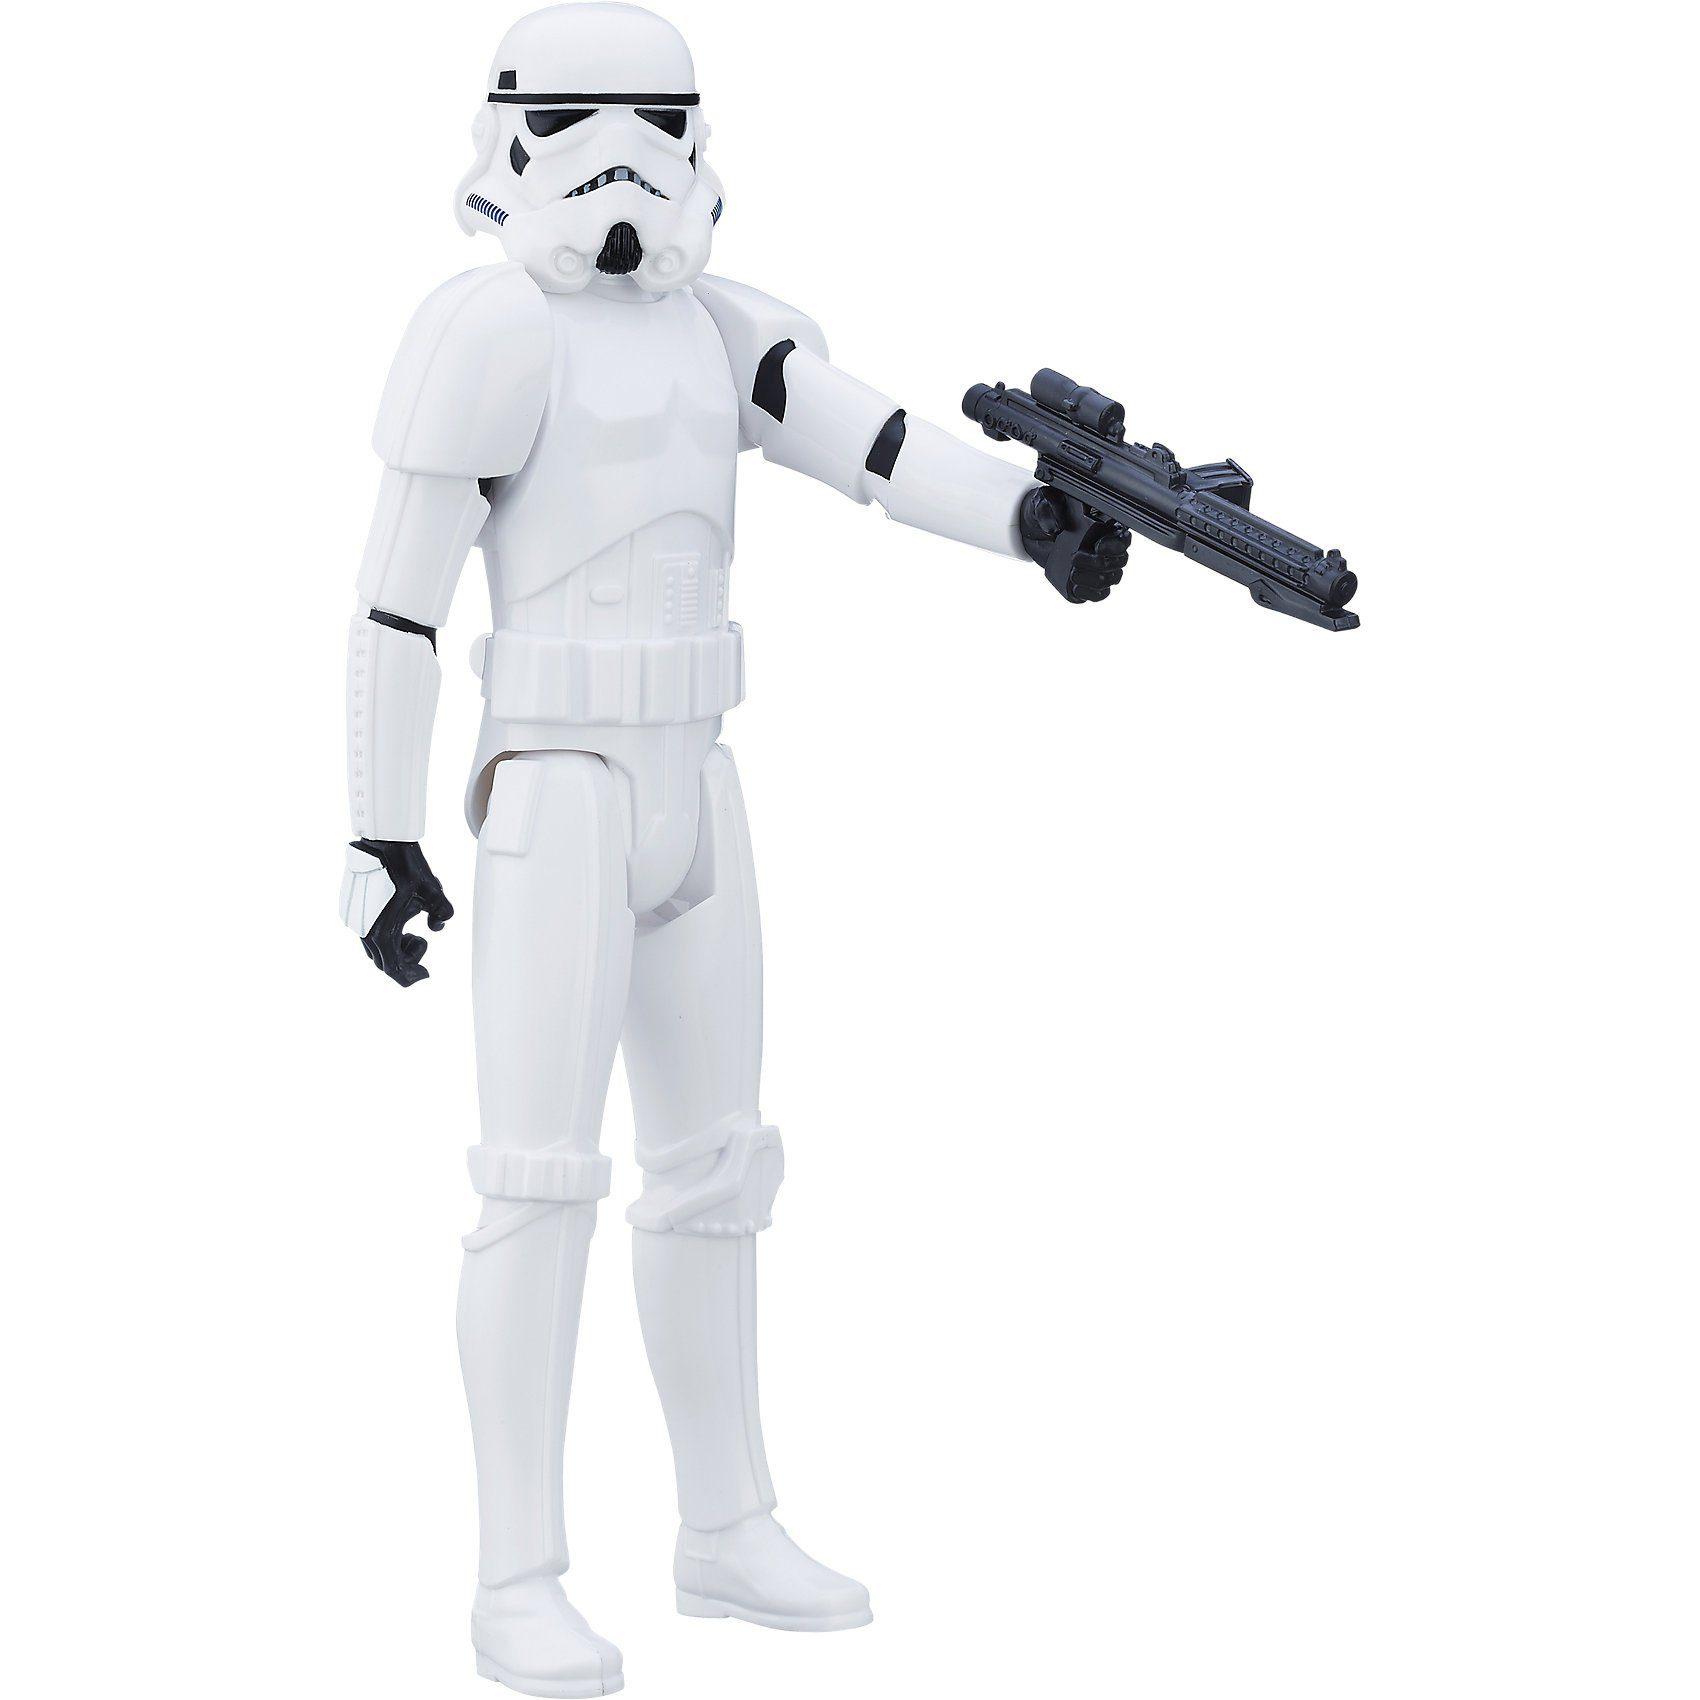 Hasbro Star Wars E7 30 cm Ultimate Figuren - Imperial Stormtrooper